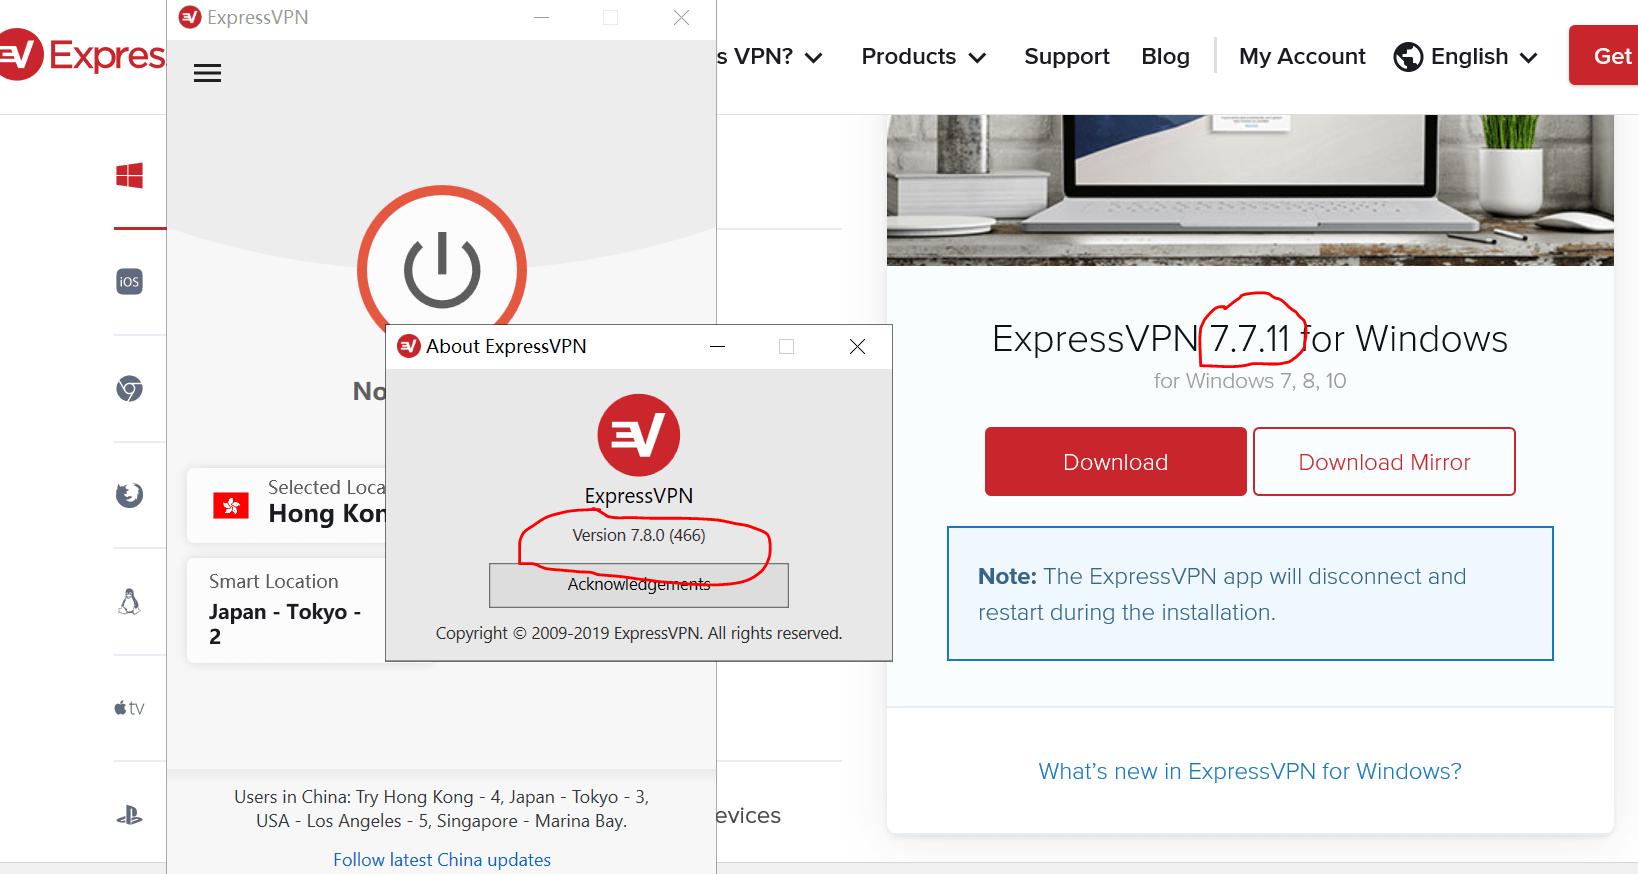 ExpressVPN Windows 版本-20200215